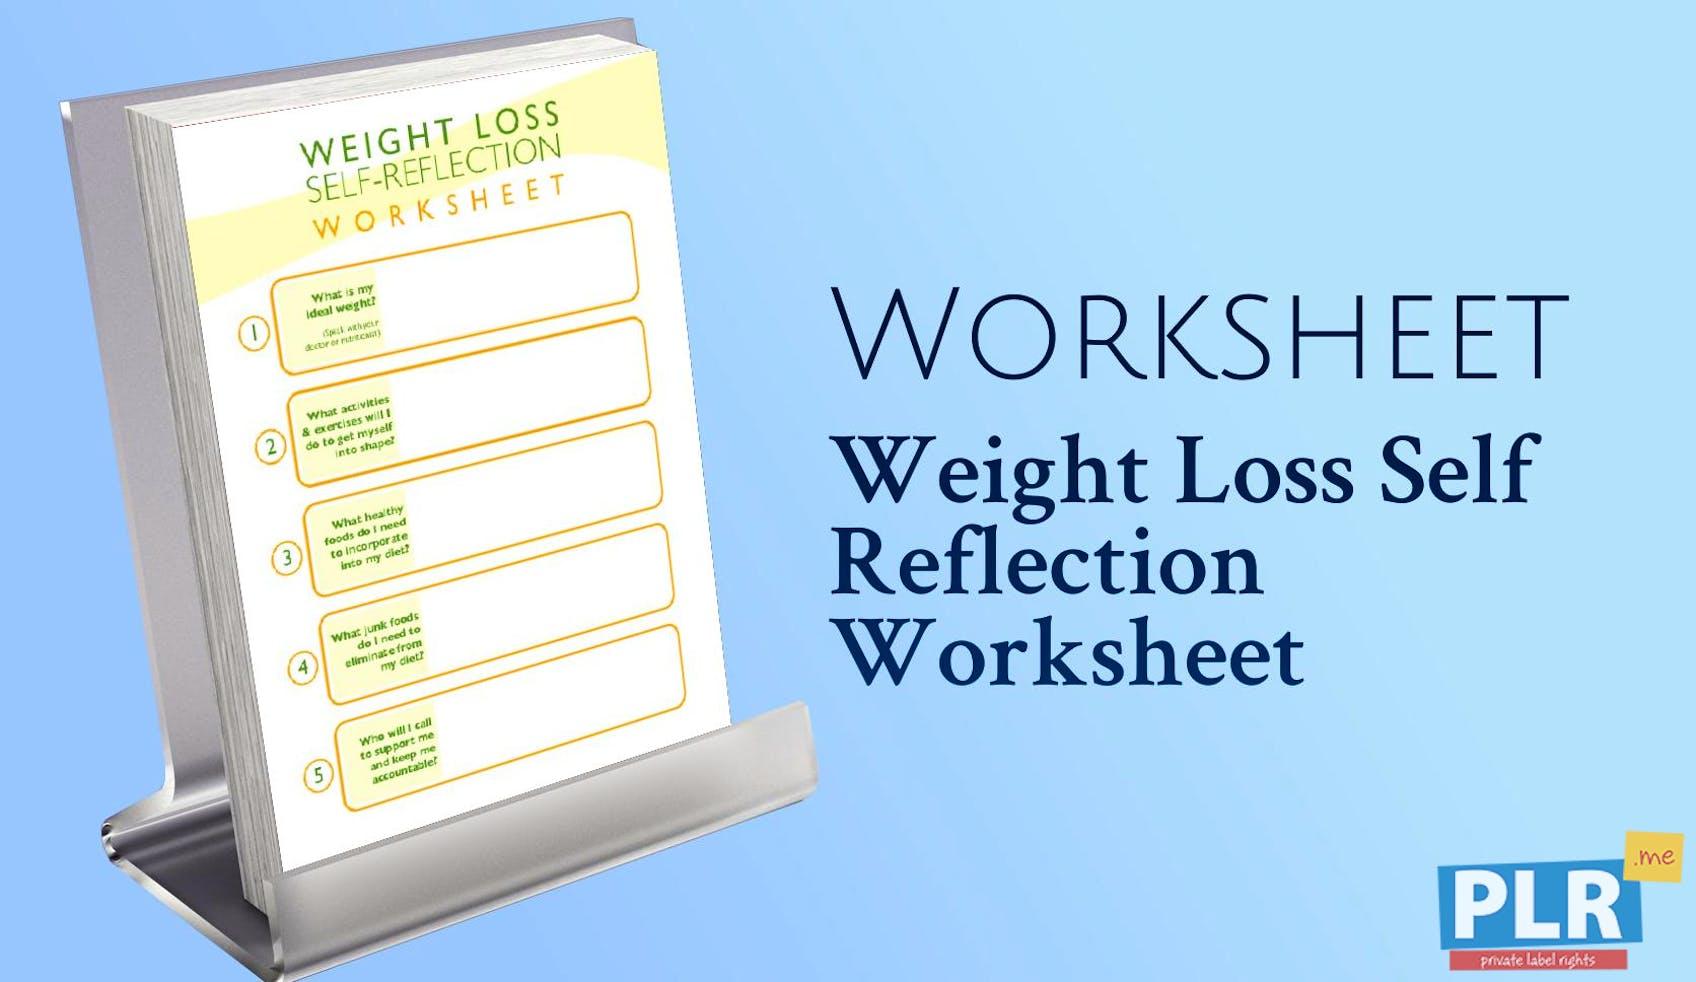 plr worksheets weight loss self reflection worksheet plr me